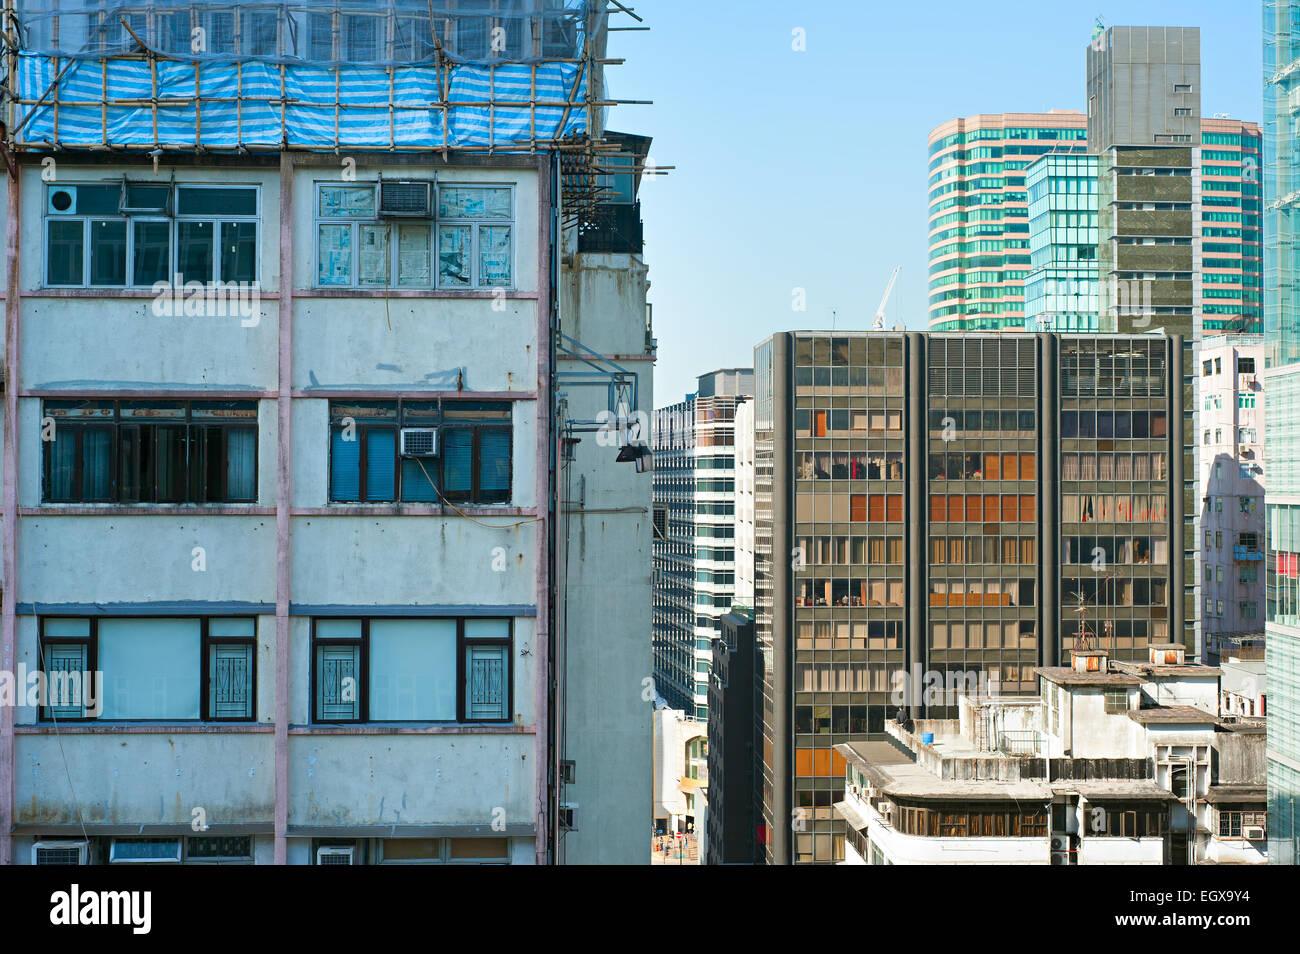 Density urban living in Kowloon island, Hong Kong - Stock Image